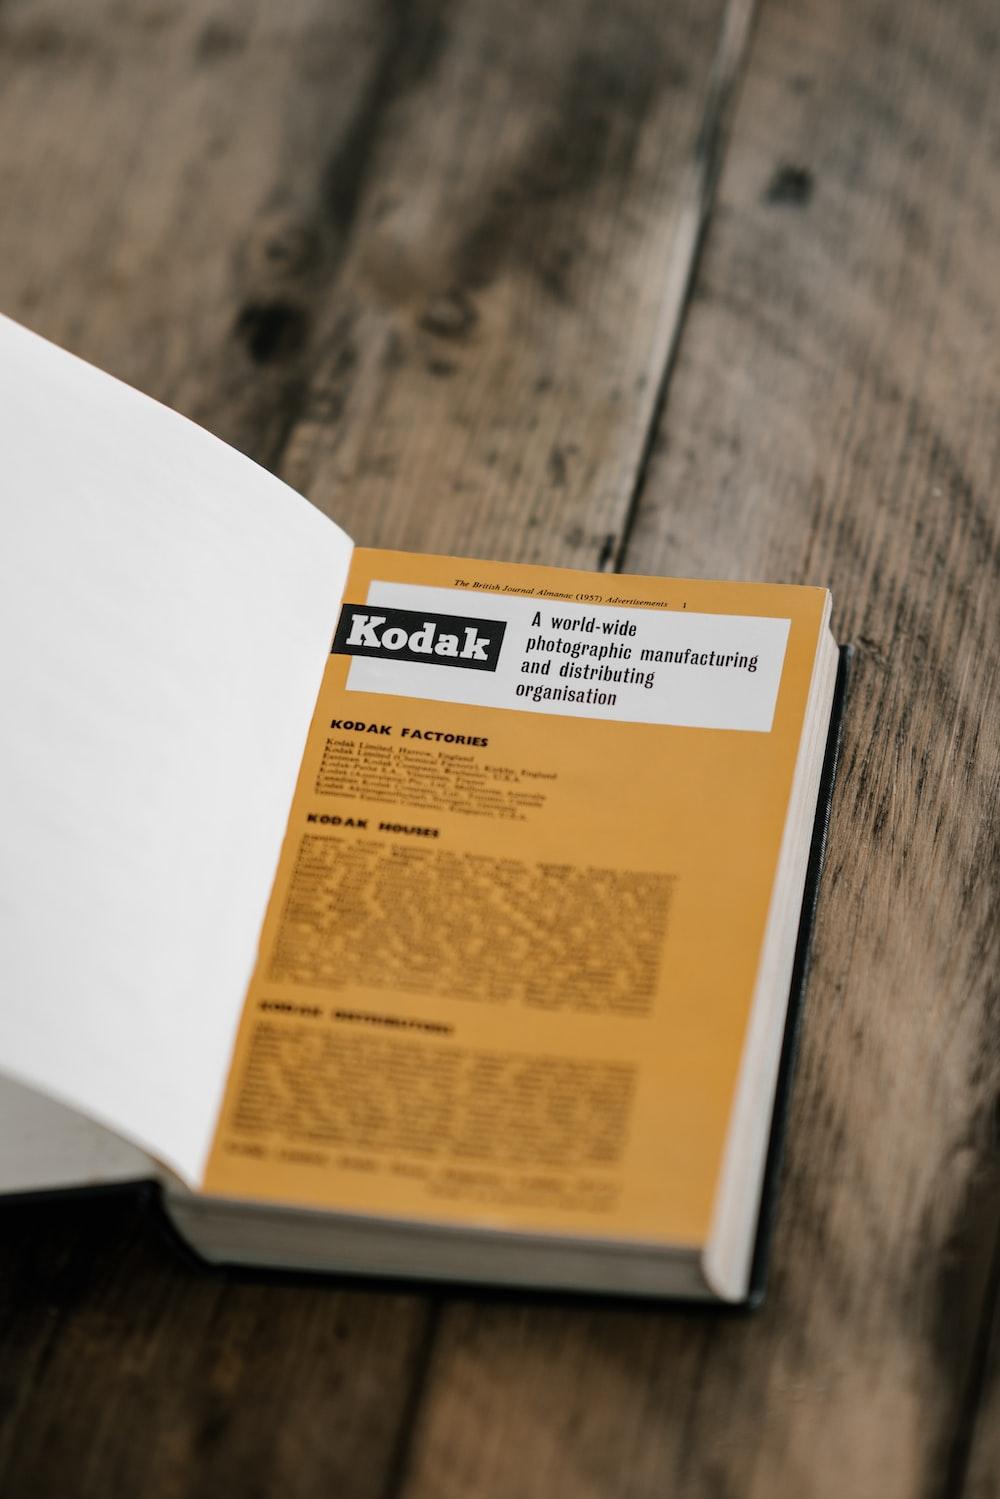 closeup photo of Kodak book